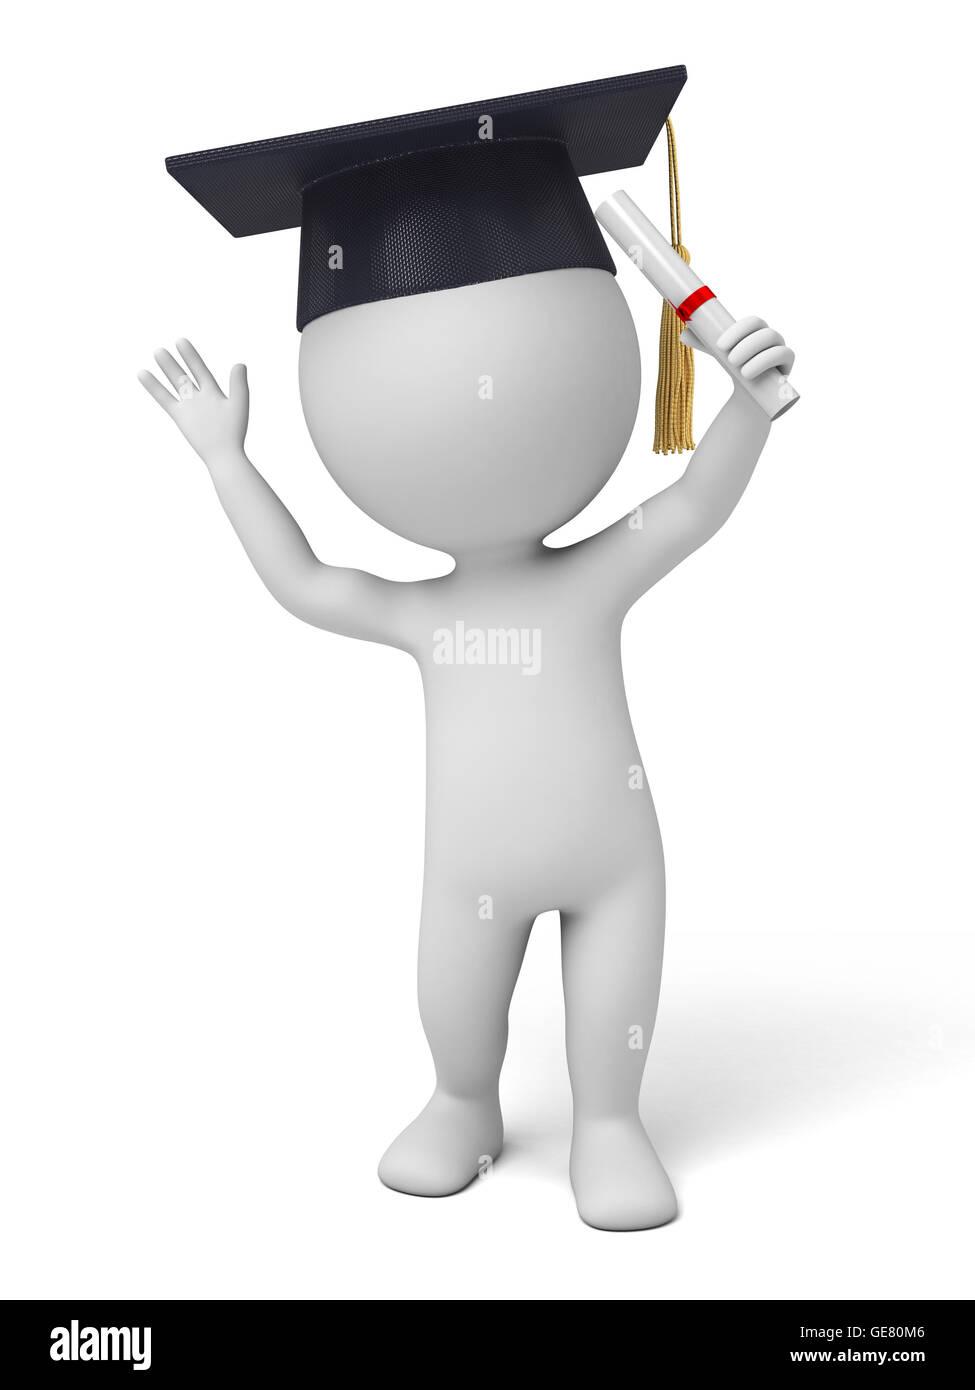 El hombre en 3D se graduó de la escuela Imagen De Stock